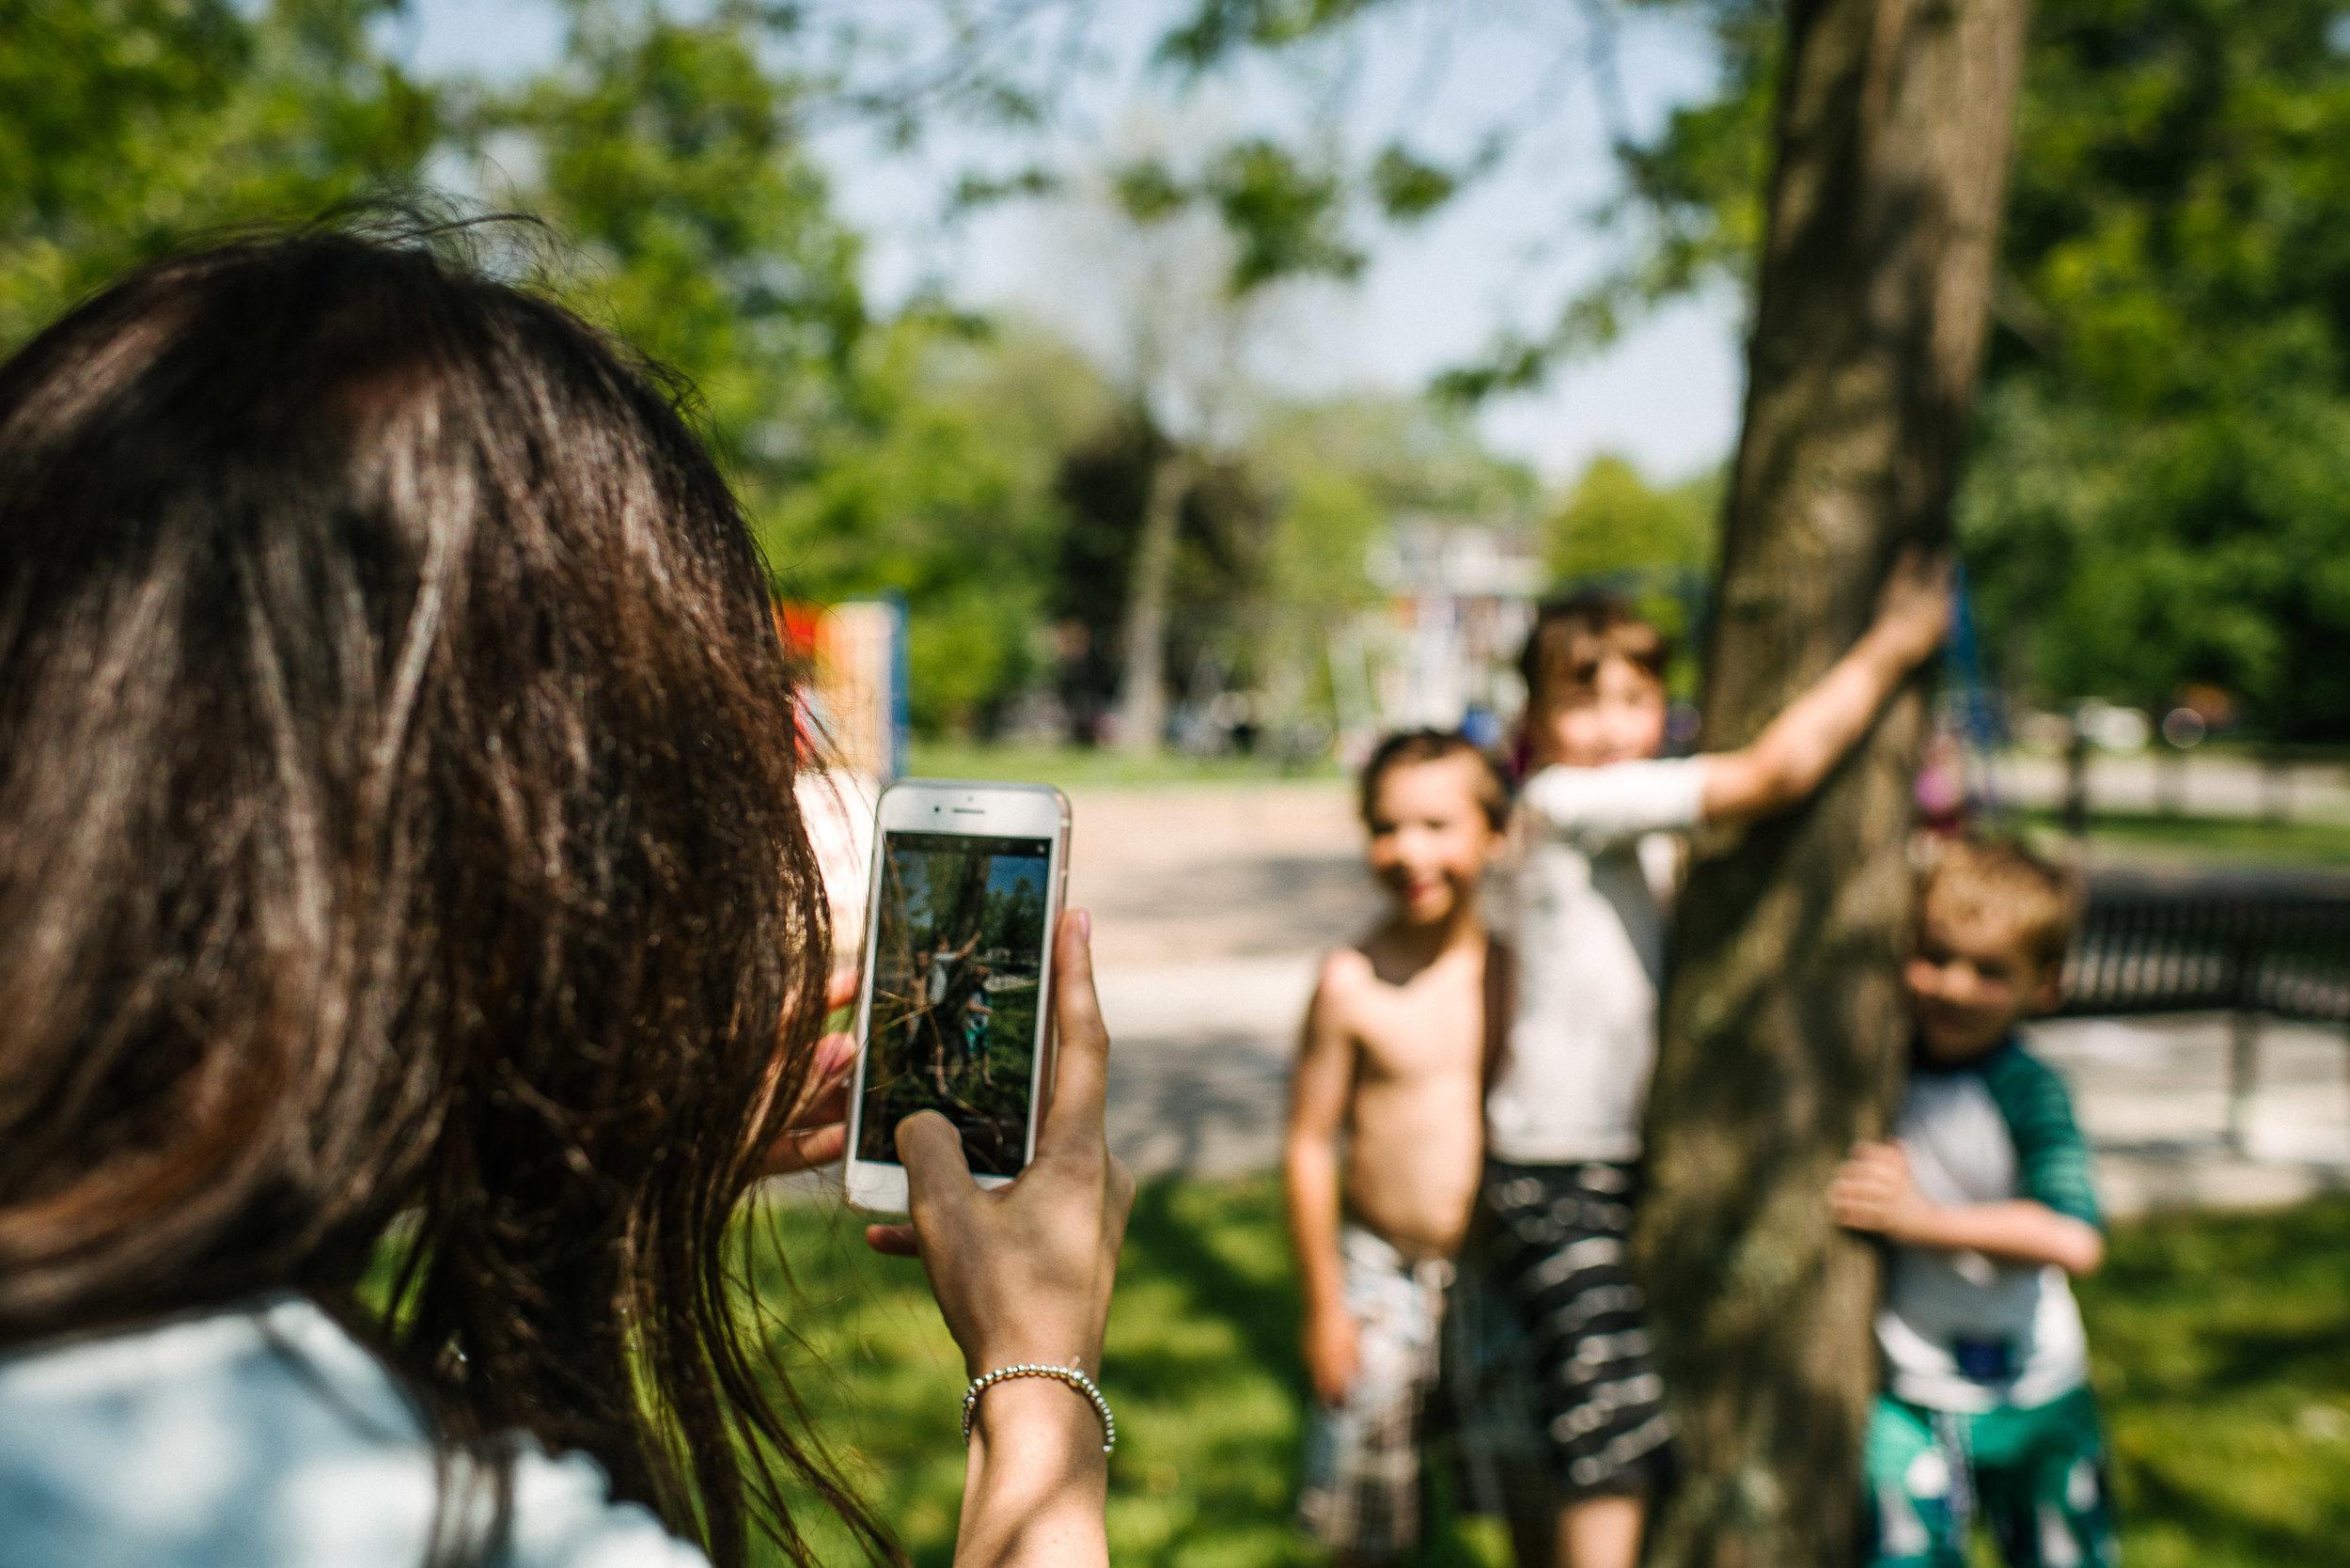 Murray going away party blog family photography viara mileva-150516vm.jpg